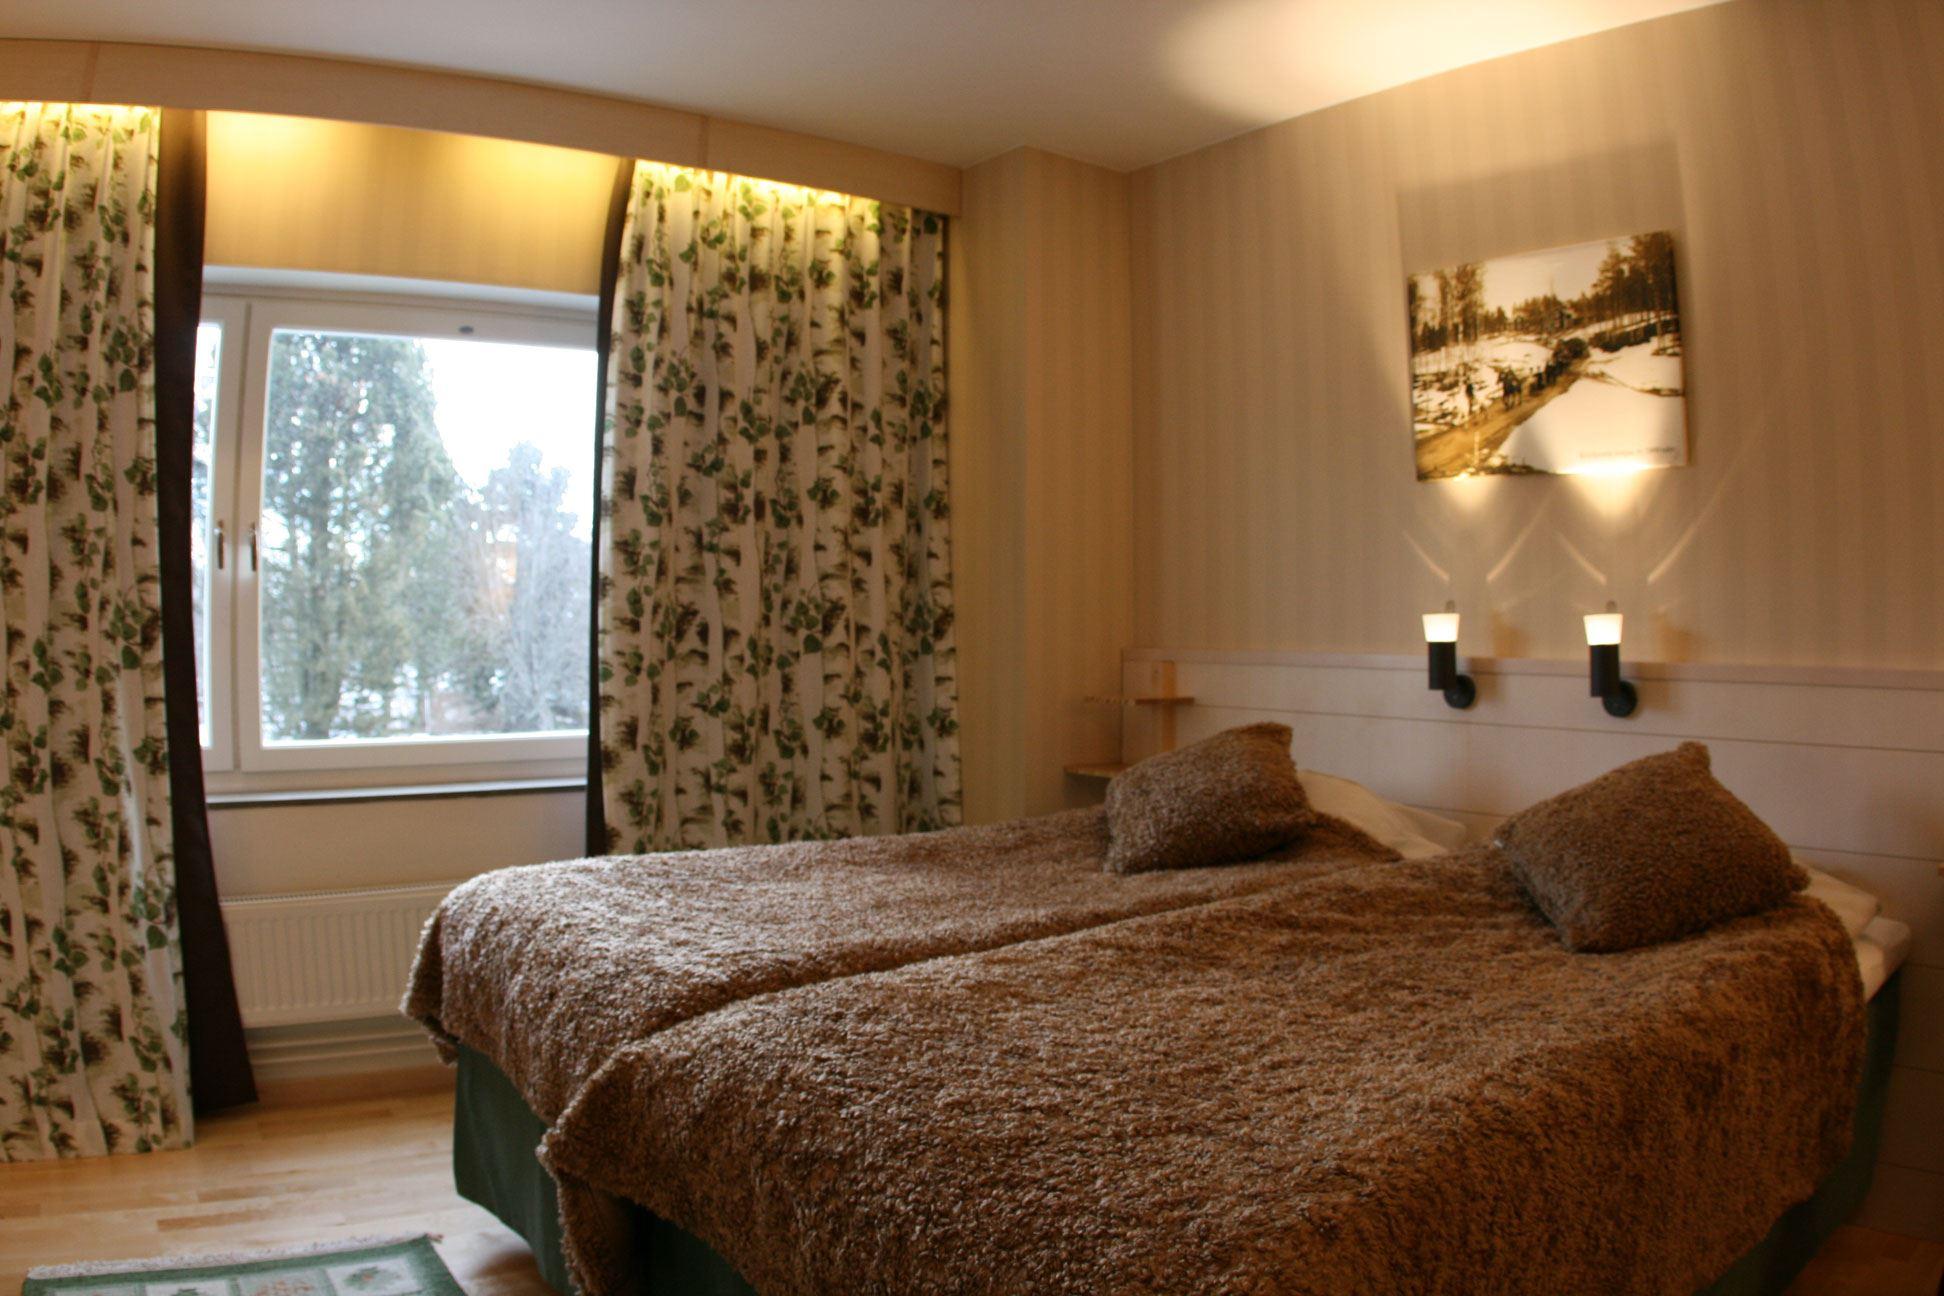 Sankt Olof Hotell & Krog